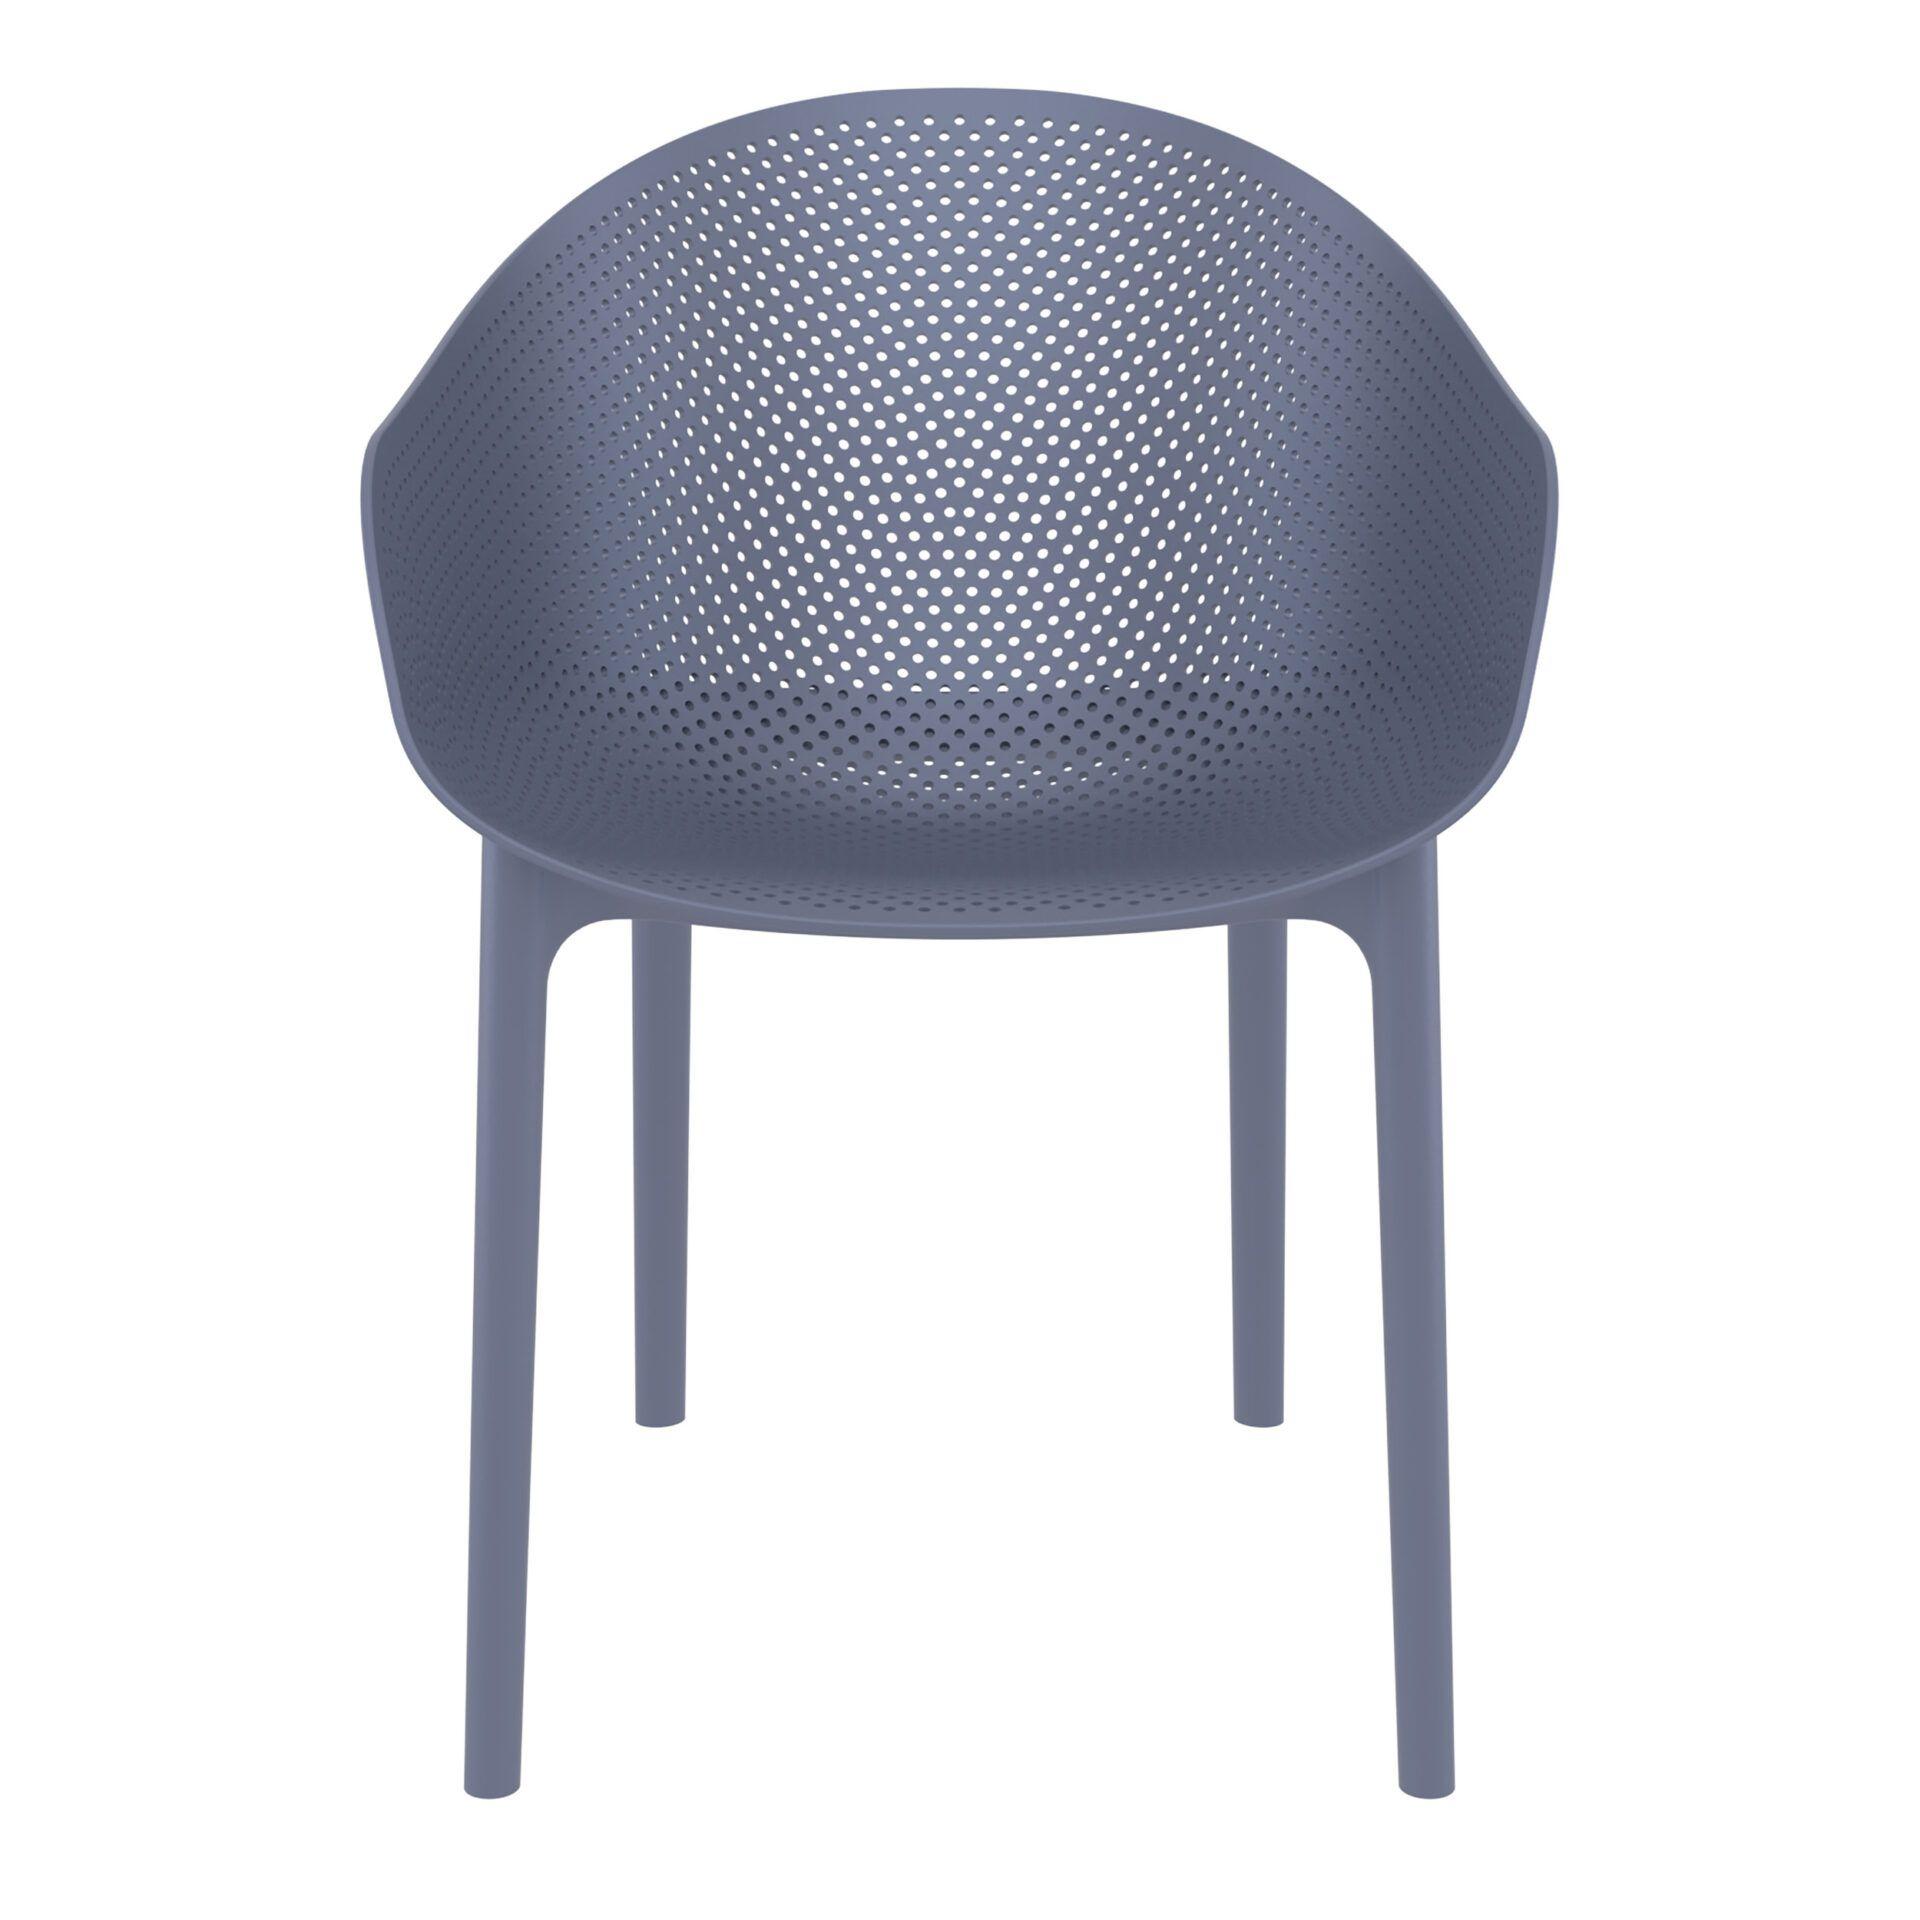 outdoor seating polypropylene sky chair darkgrey front